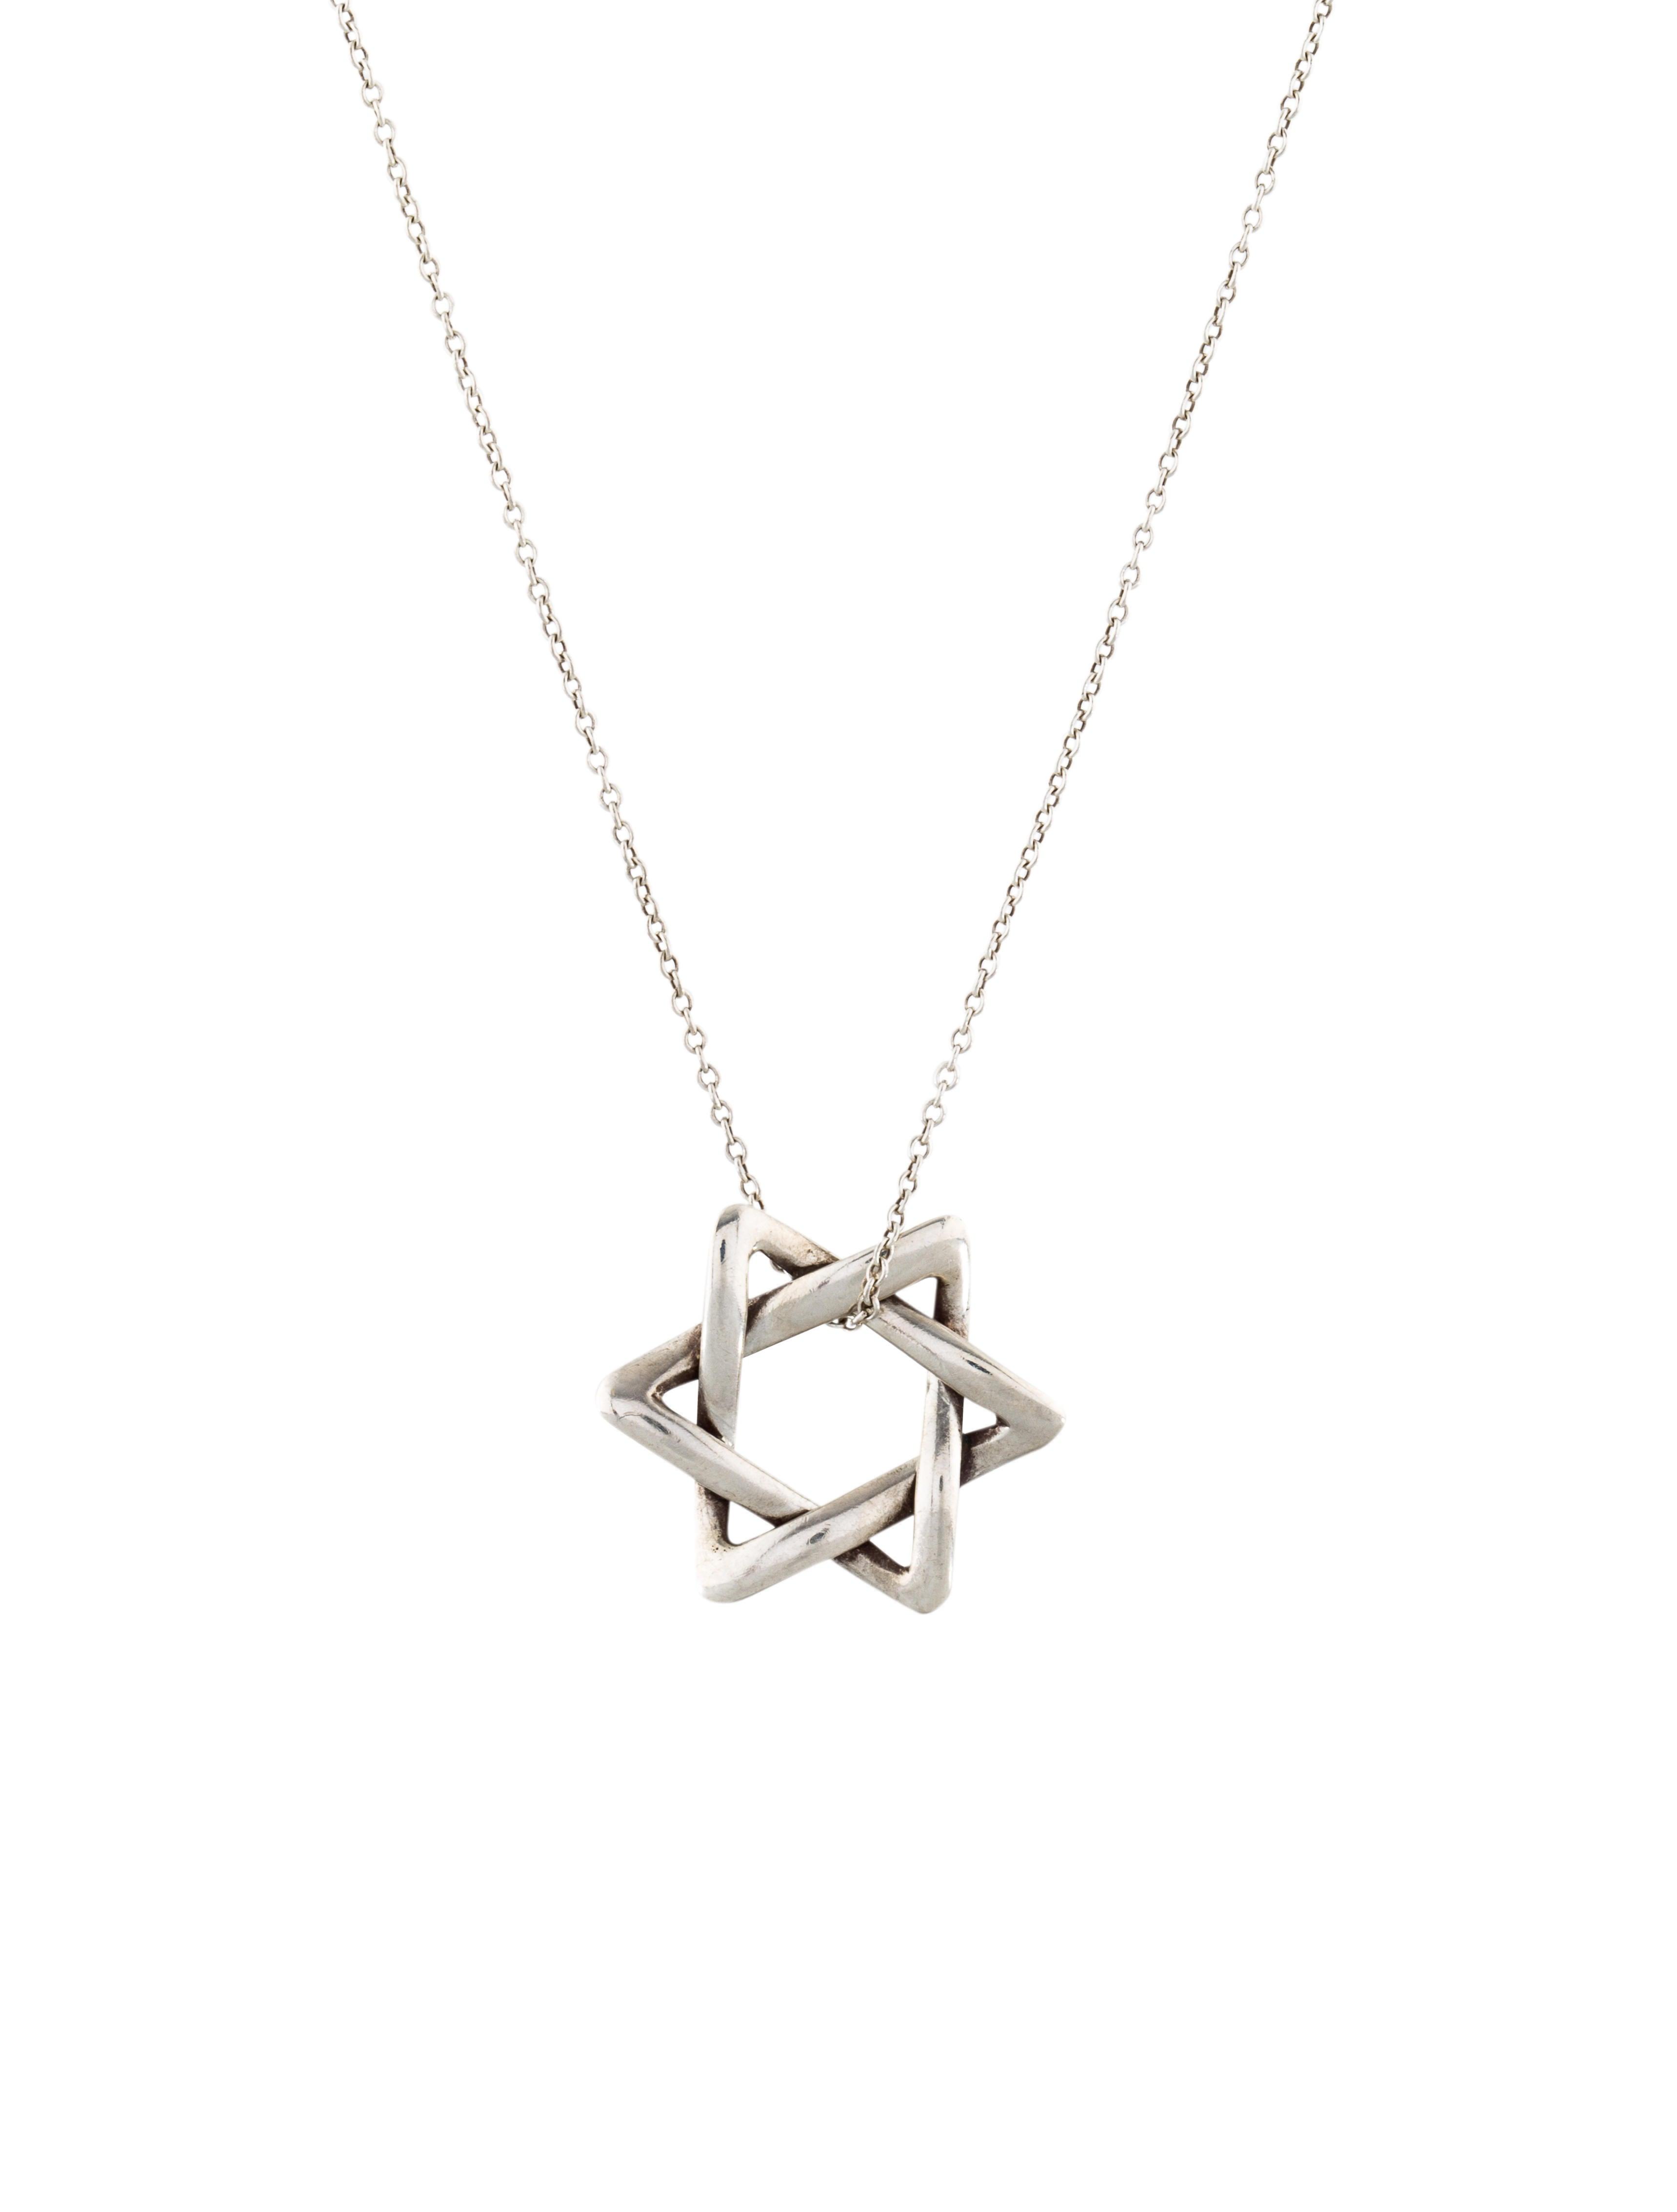 tiffany co star of david pendant necklace necklaces tif77385